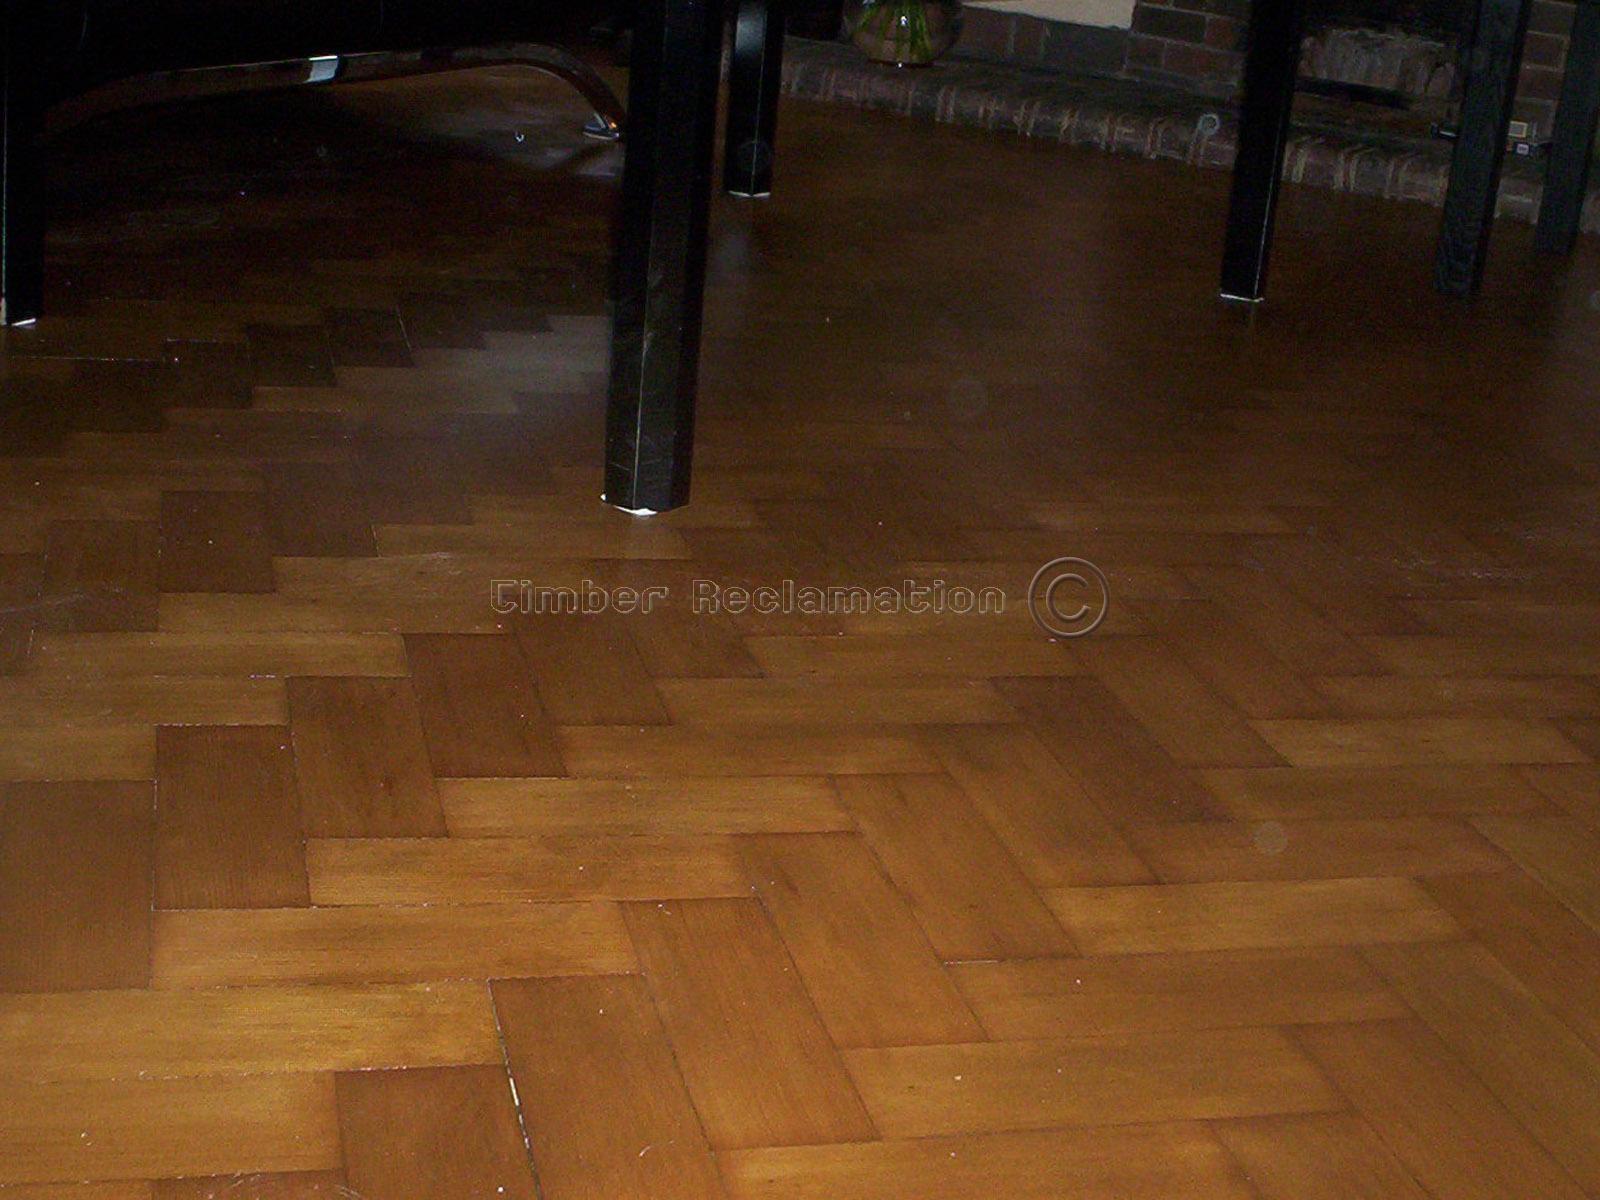 pitch pine parquet flooring. Black Bedroom Furniture Sets. Home Design Ideas